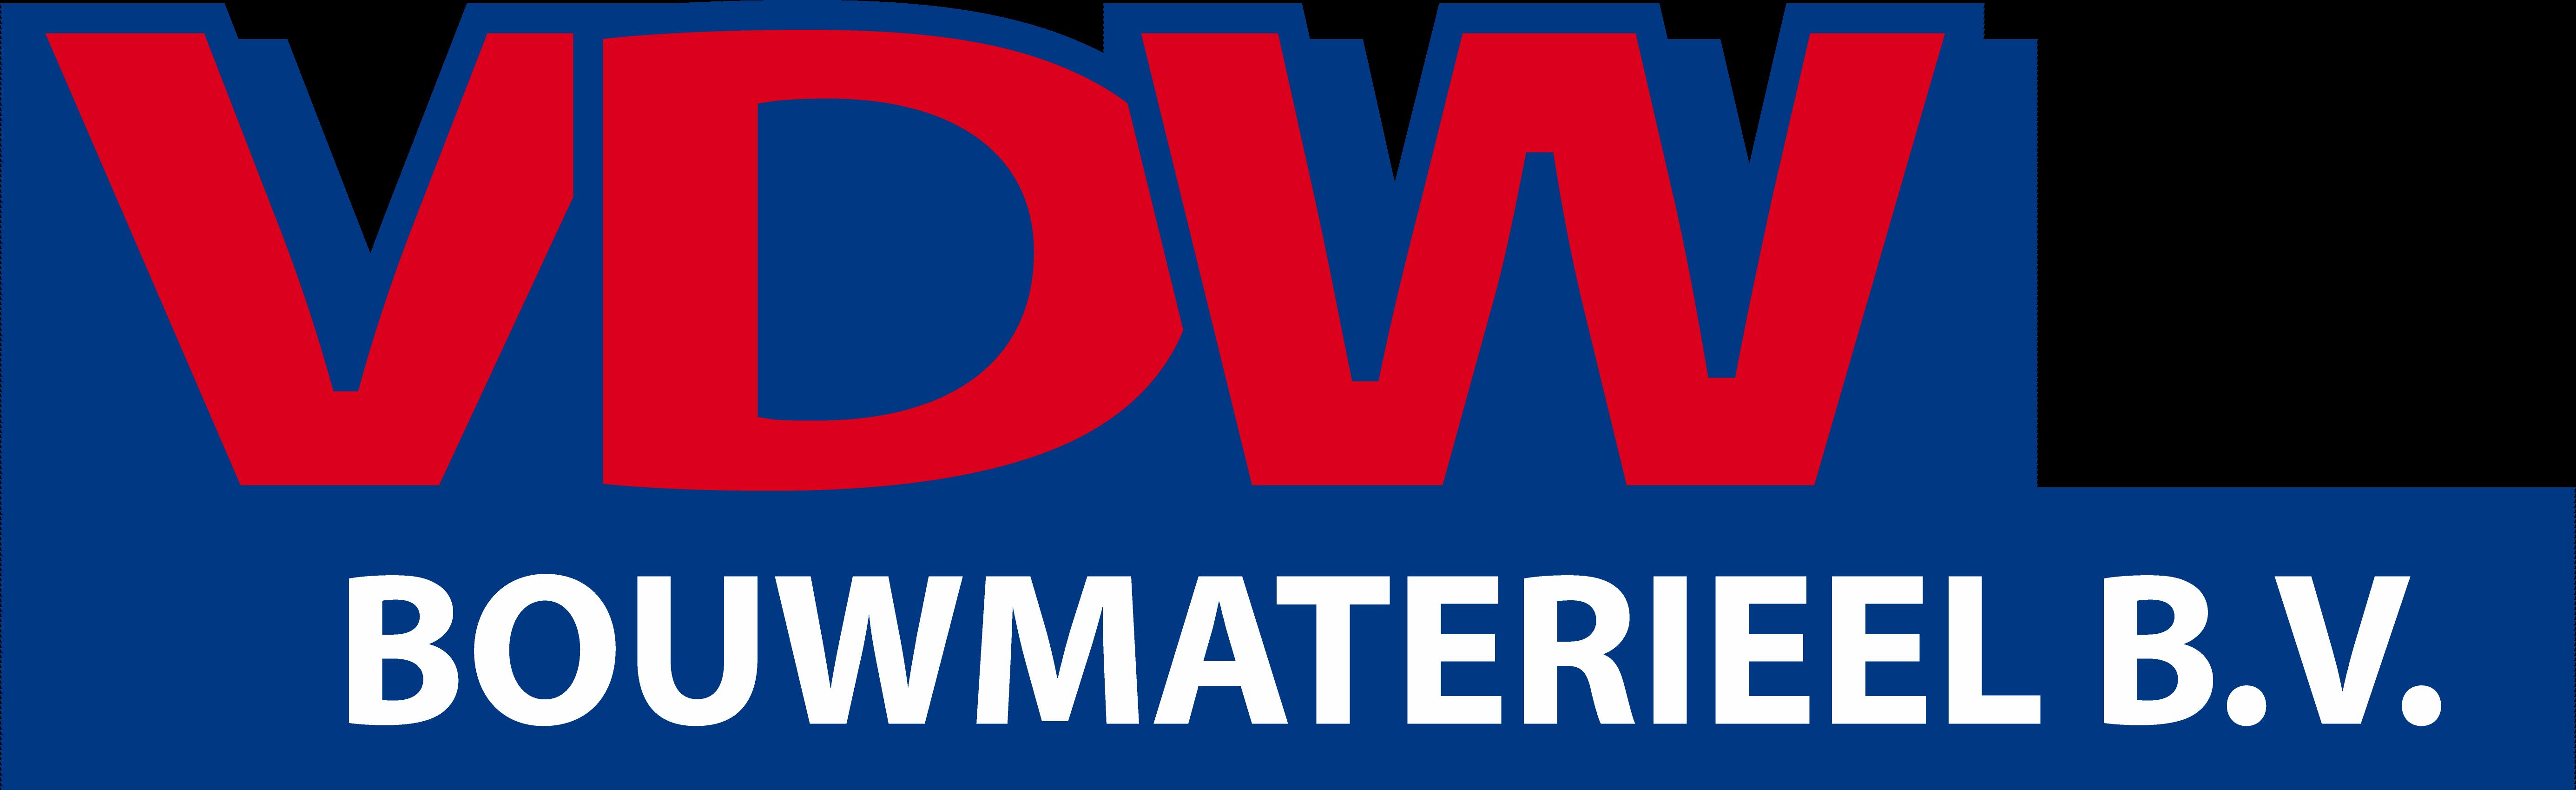 VDW Bouwmaterieel B.V.